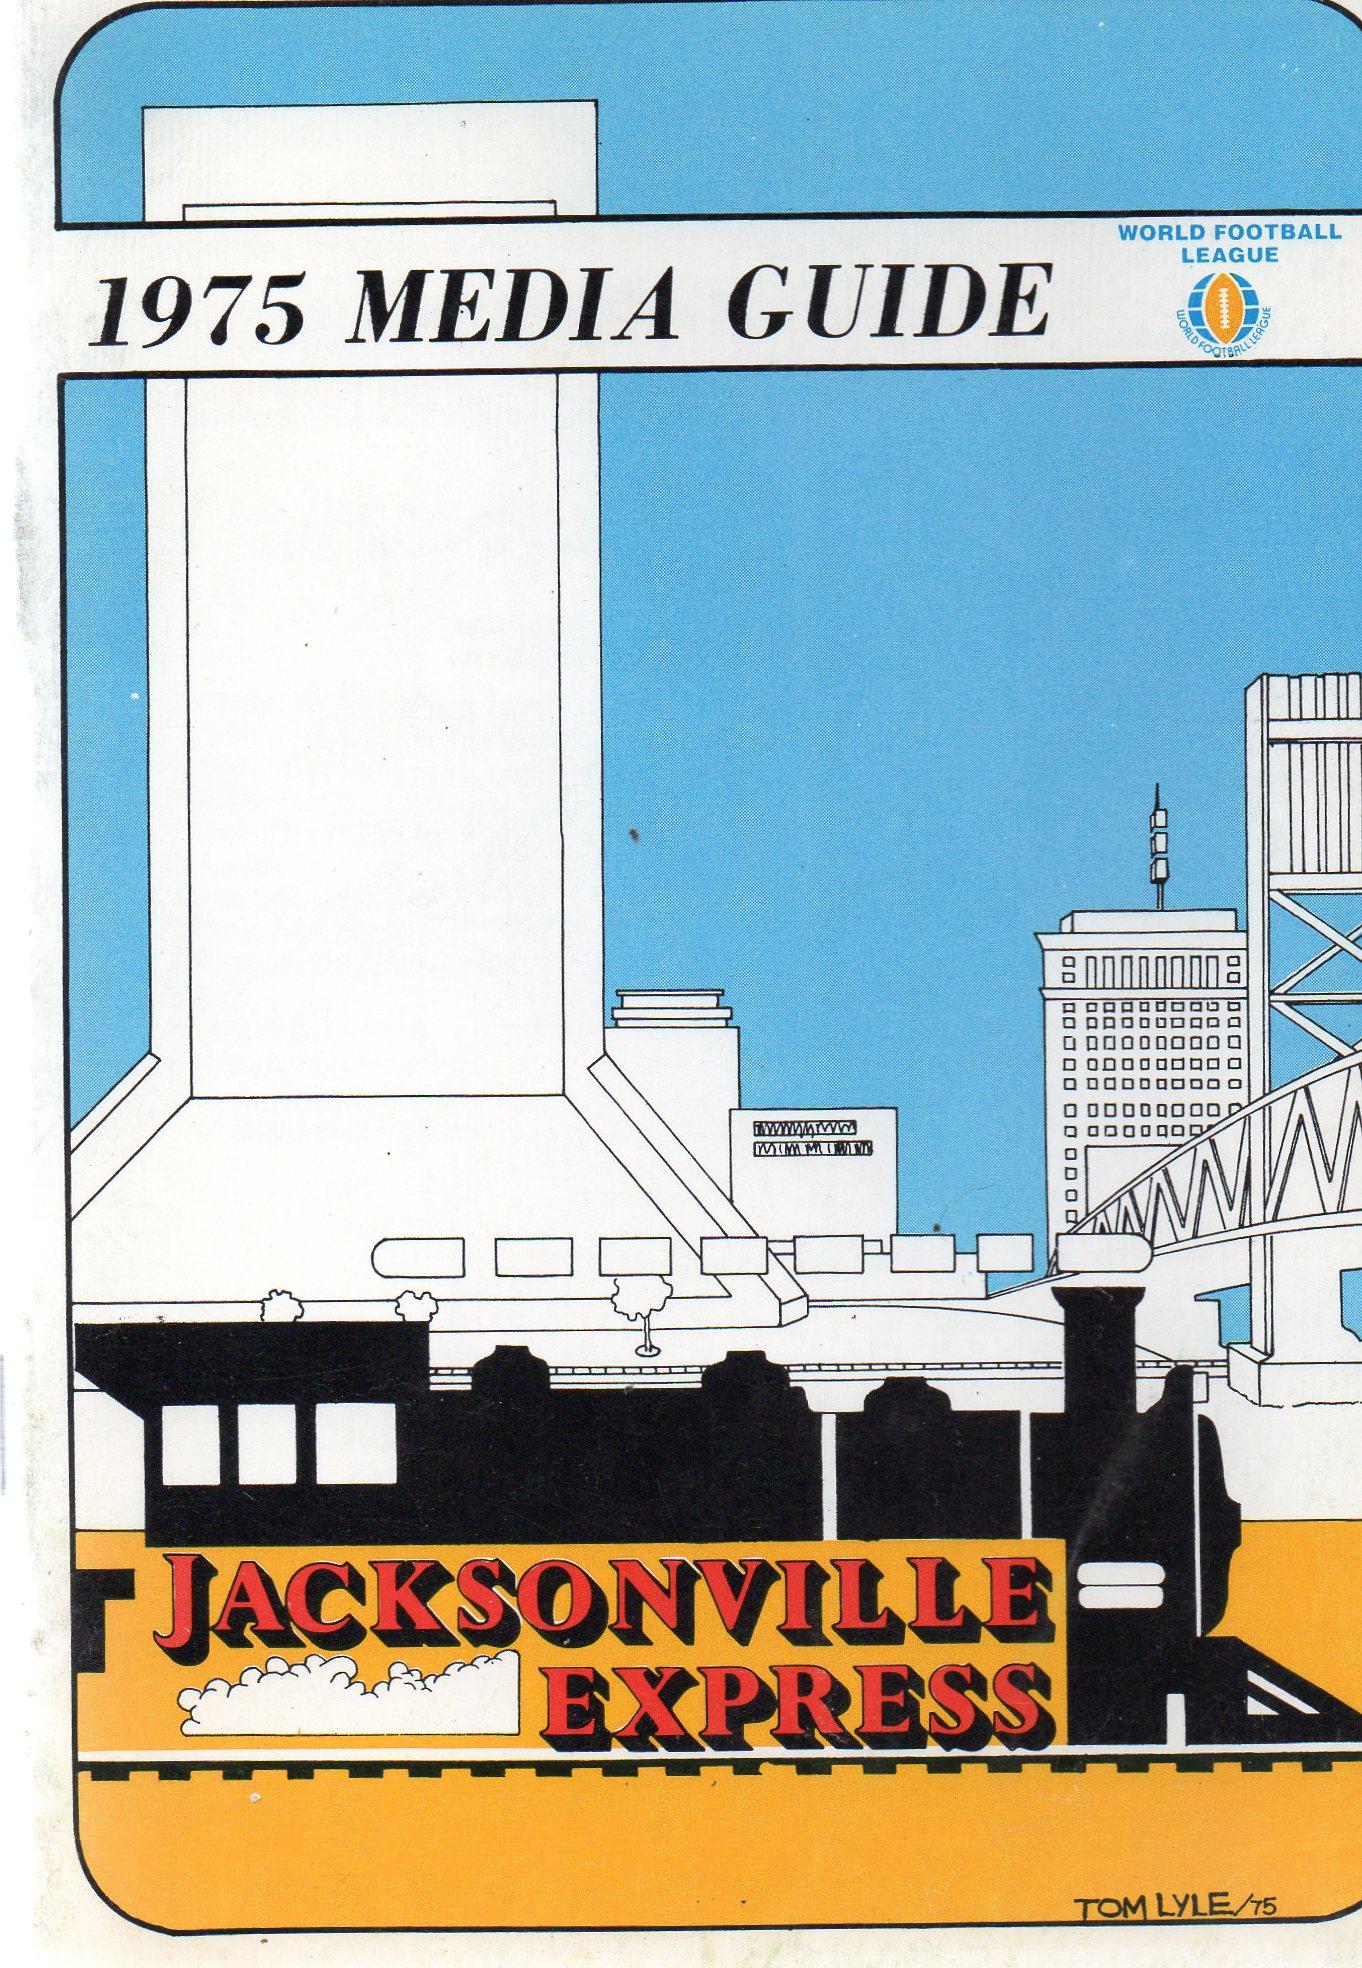 JacksonvilleExpressWFL1975Media.jpg